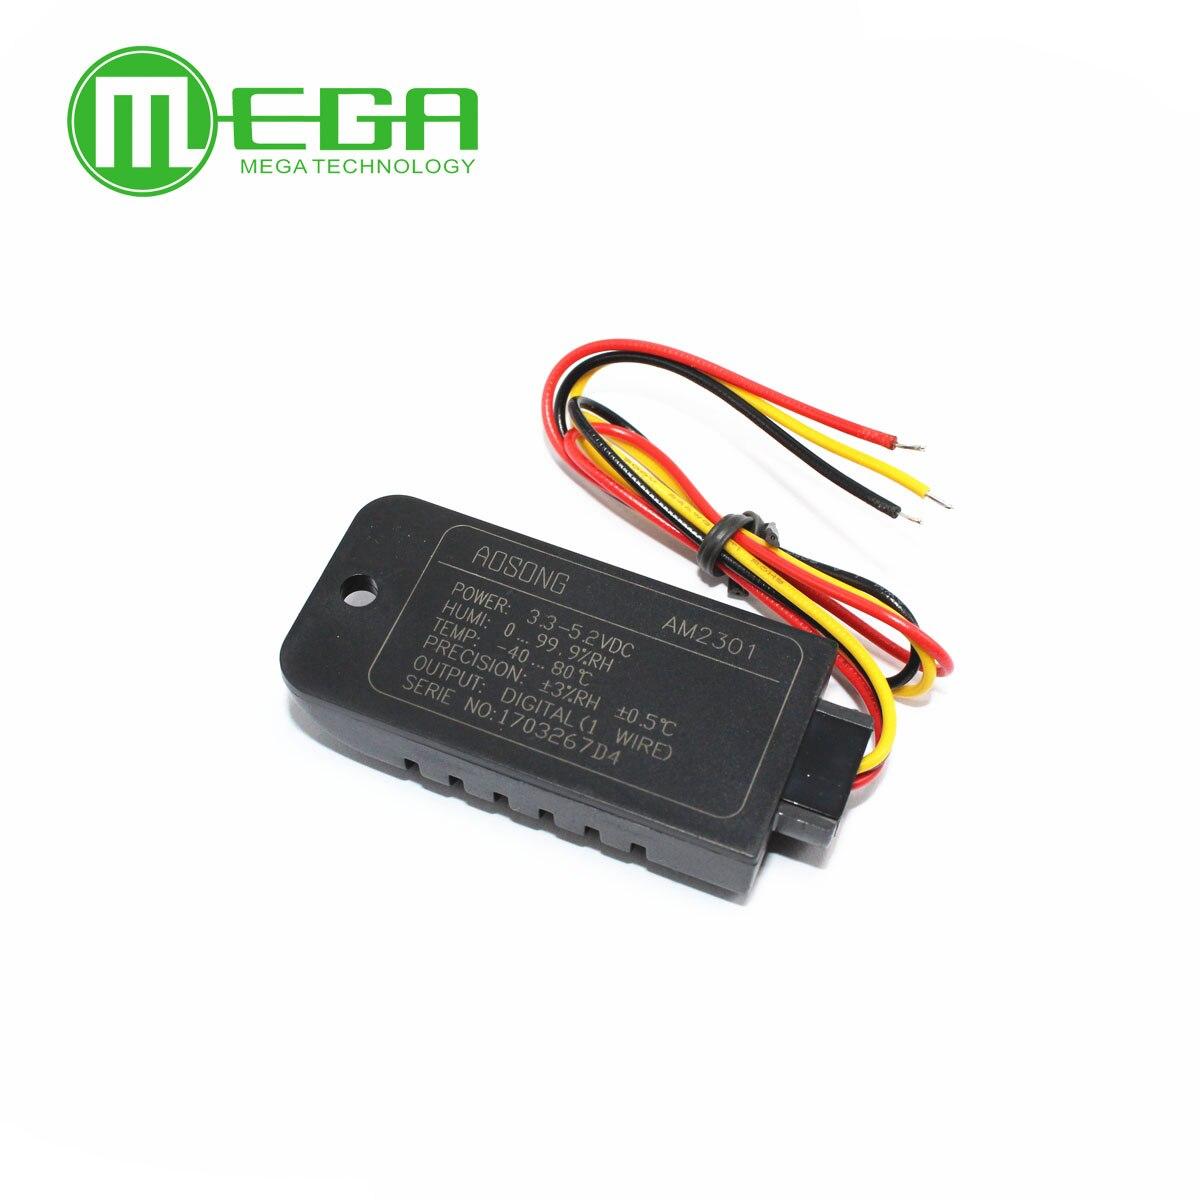 10pcs DHT21 100% New Digital-output relative humidity & temperature sensor/module,connect with single-bus-line Sensor AM2301